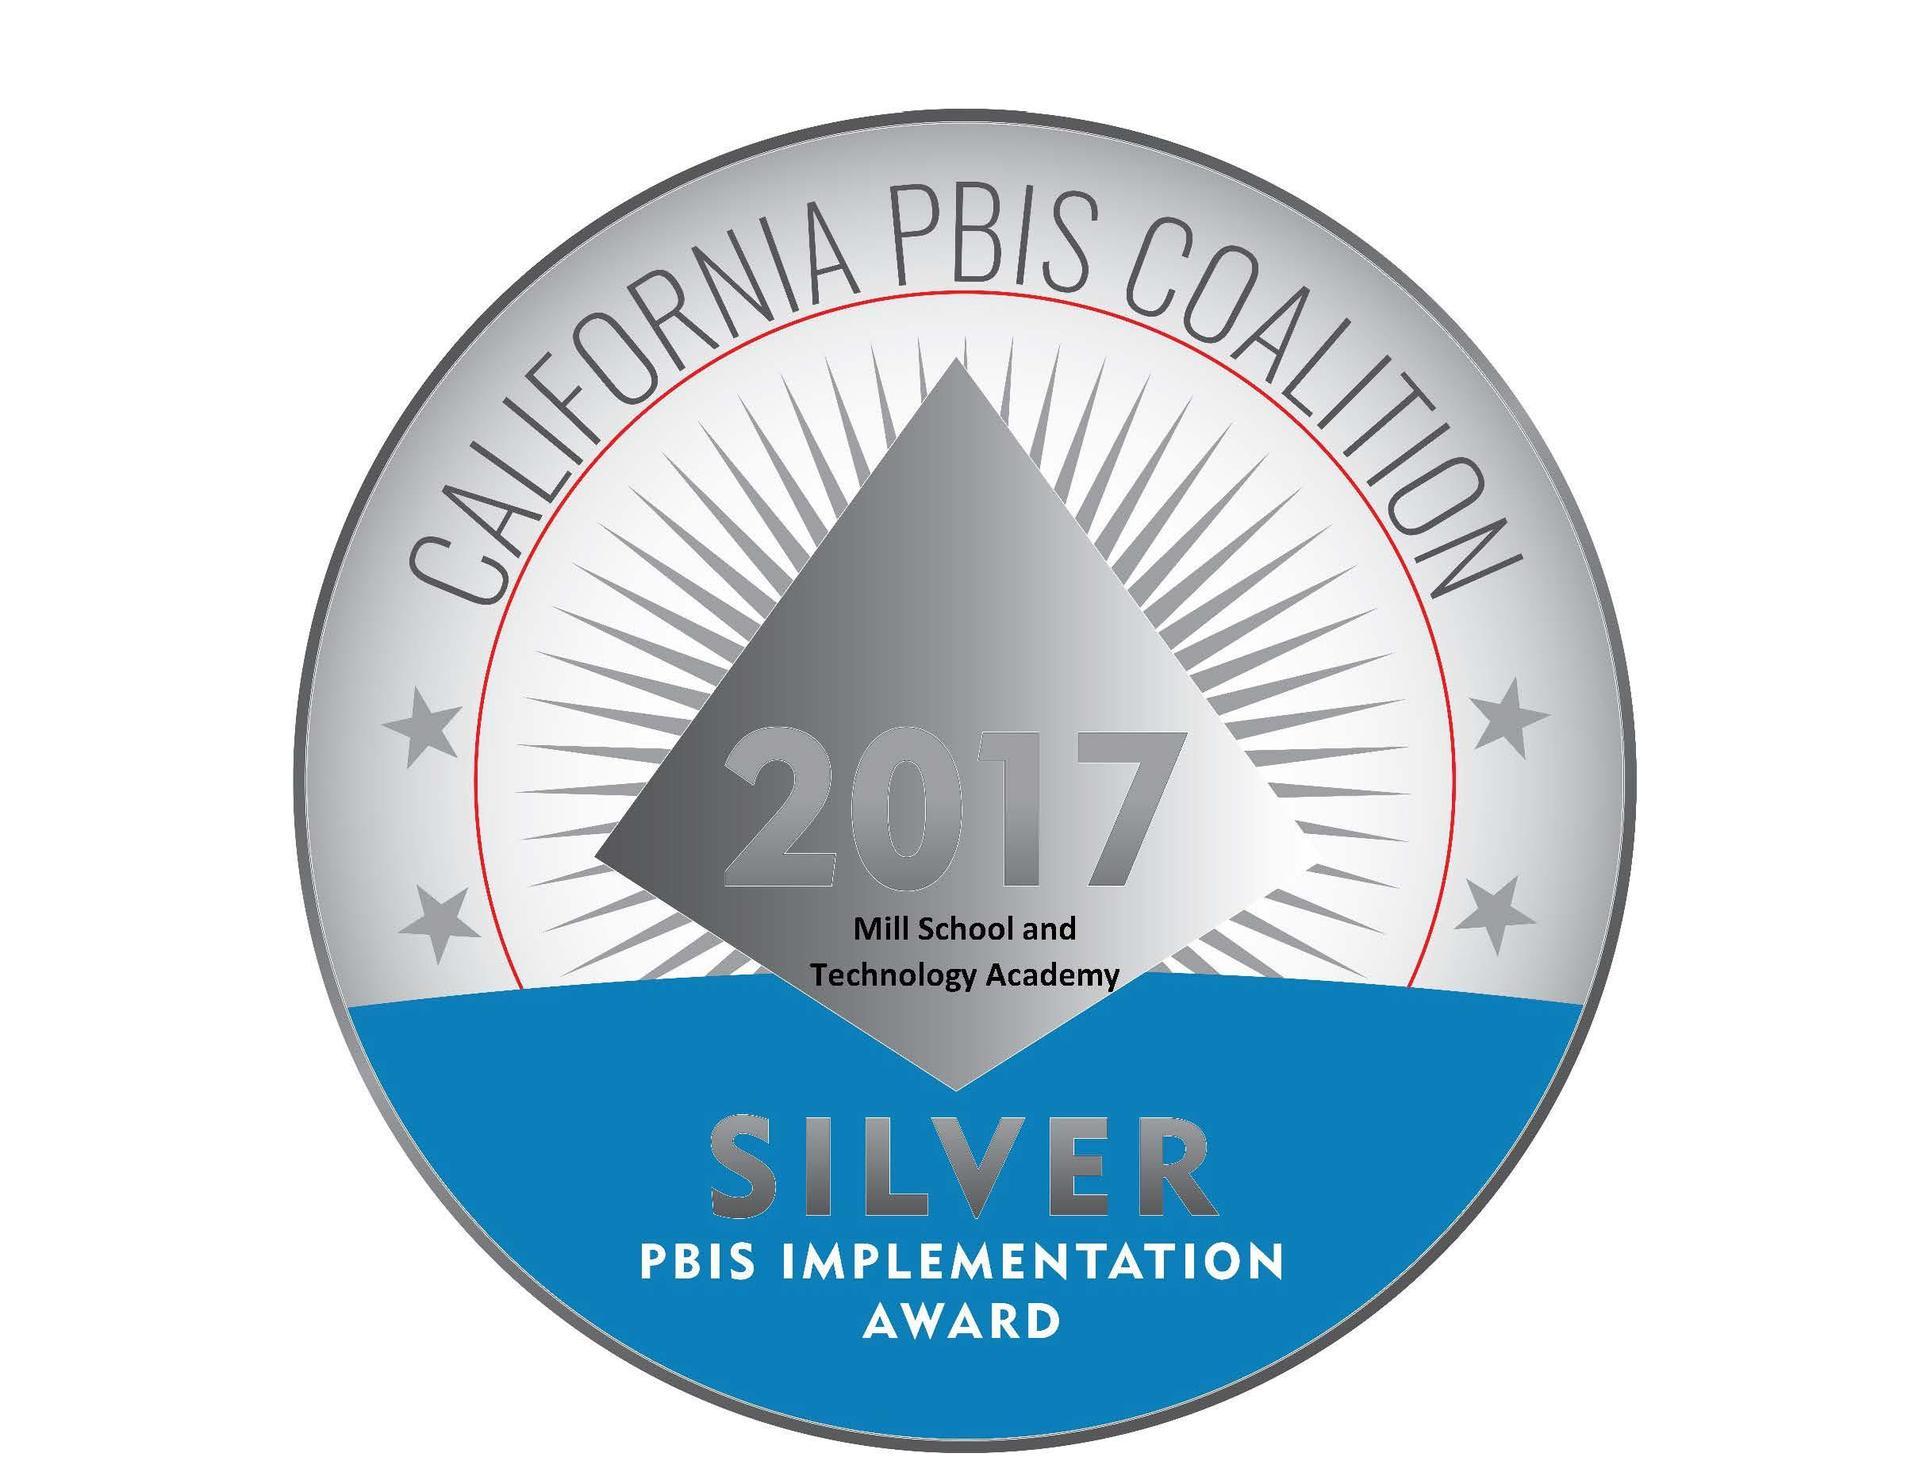 2017 PBIS Silver Award Logo